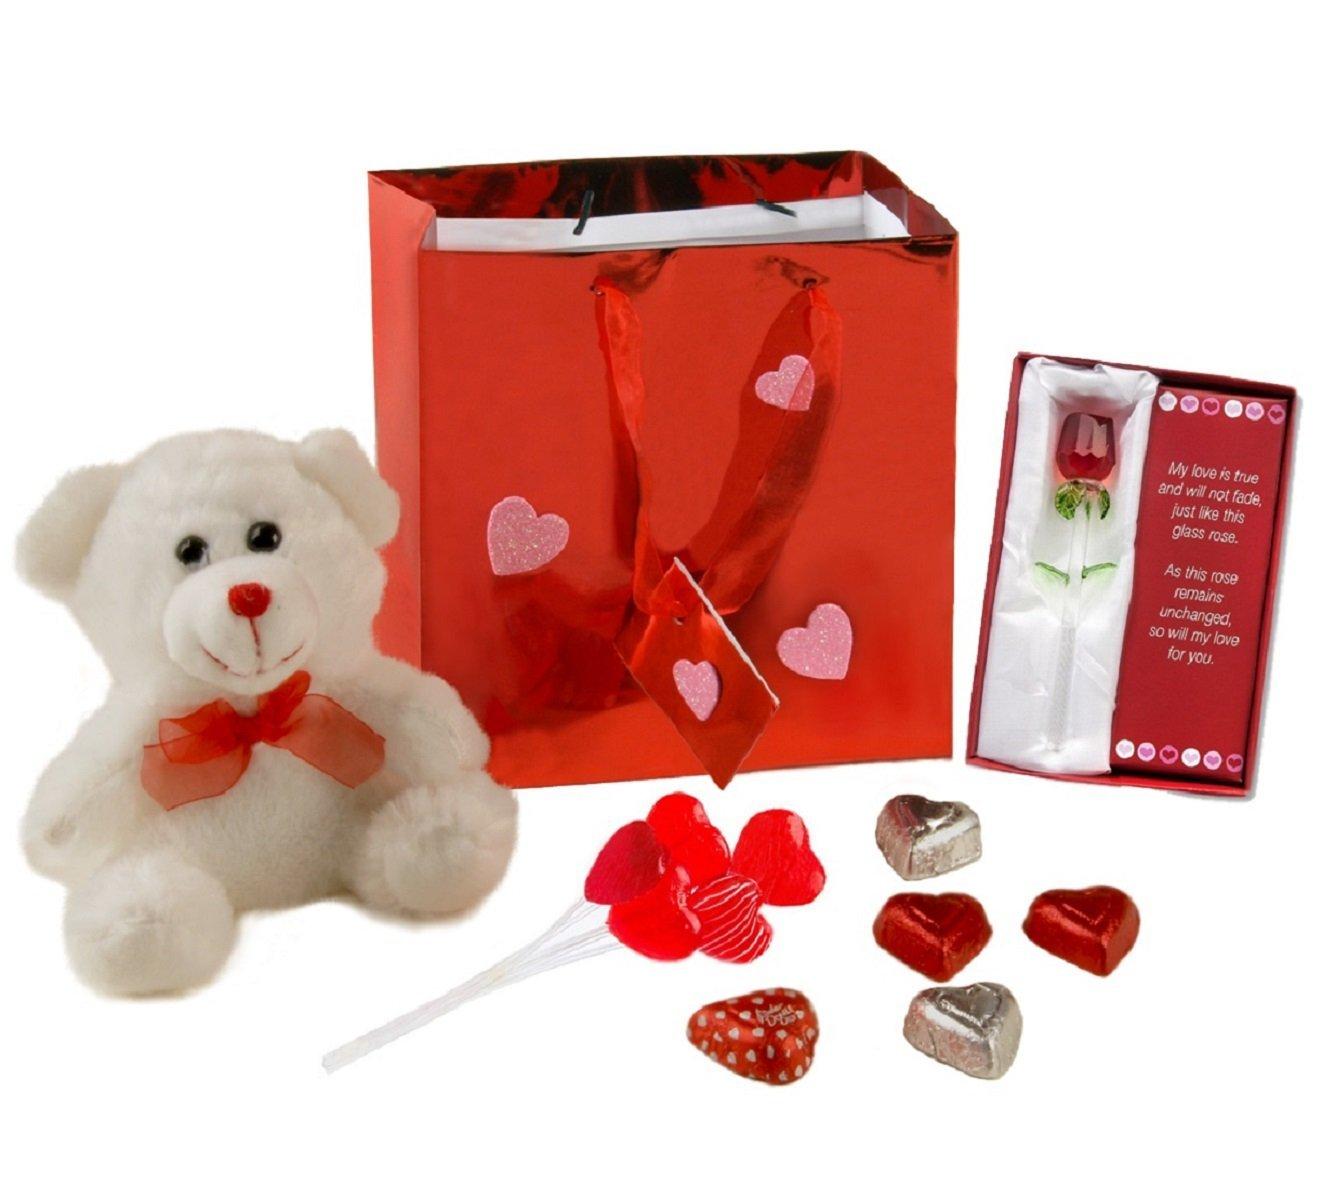 Rose day -Gifts -V6